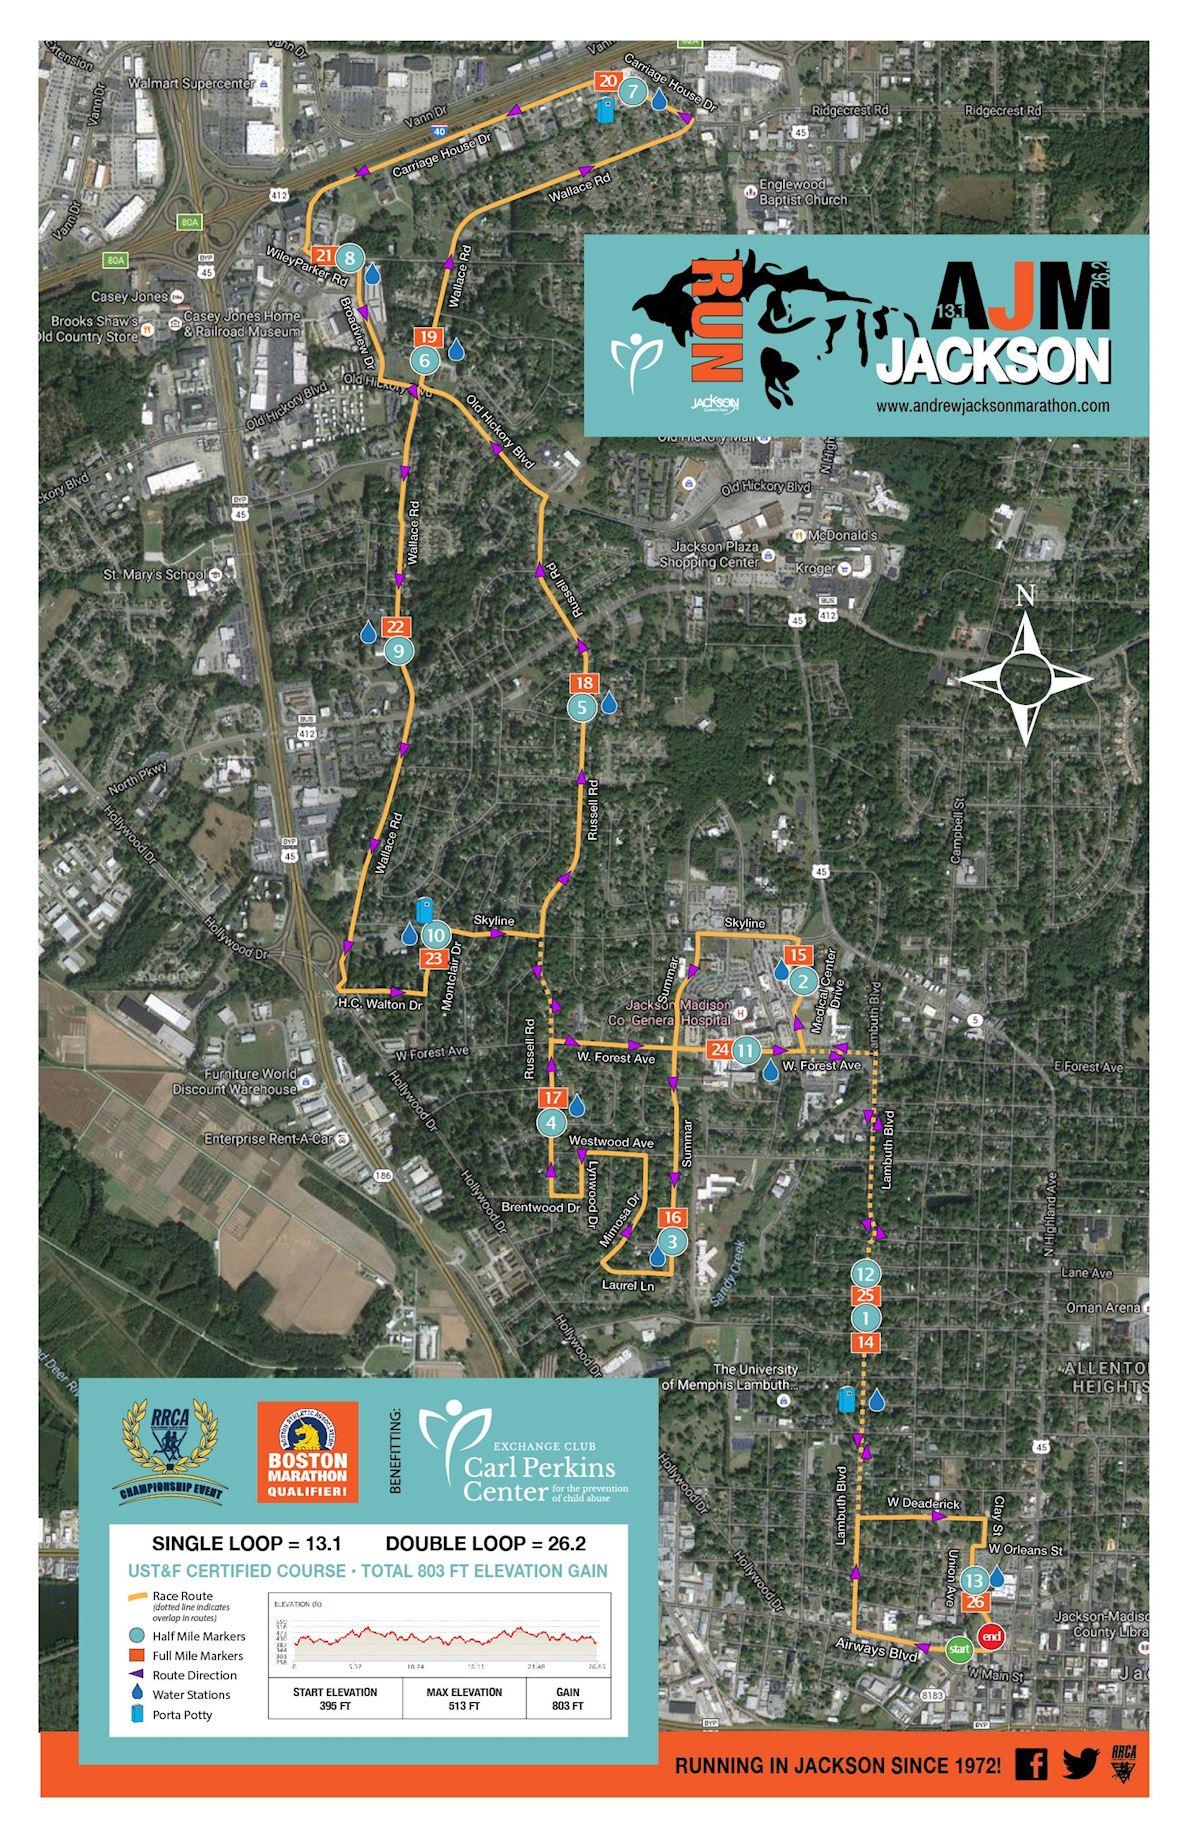 Andrew Jackson Marathon, Half Marathon & 5K Run Routenkarte